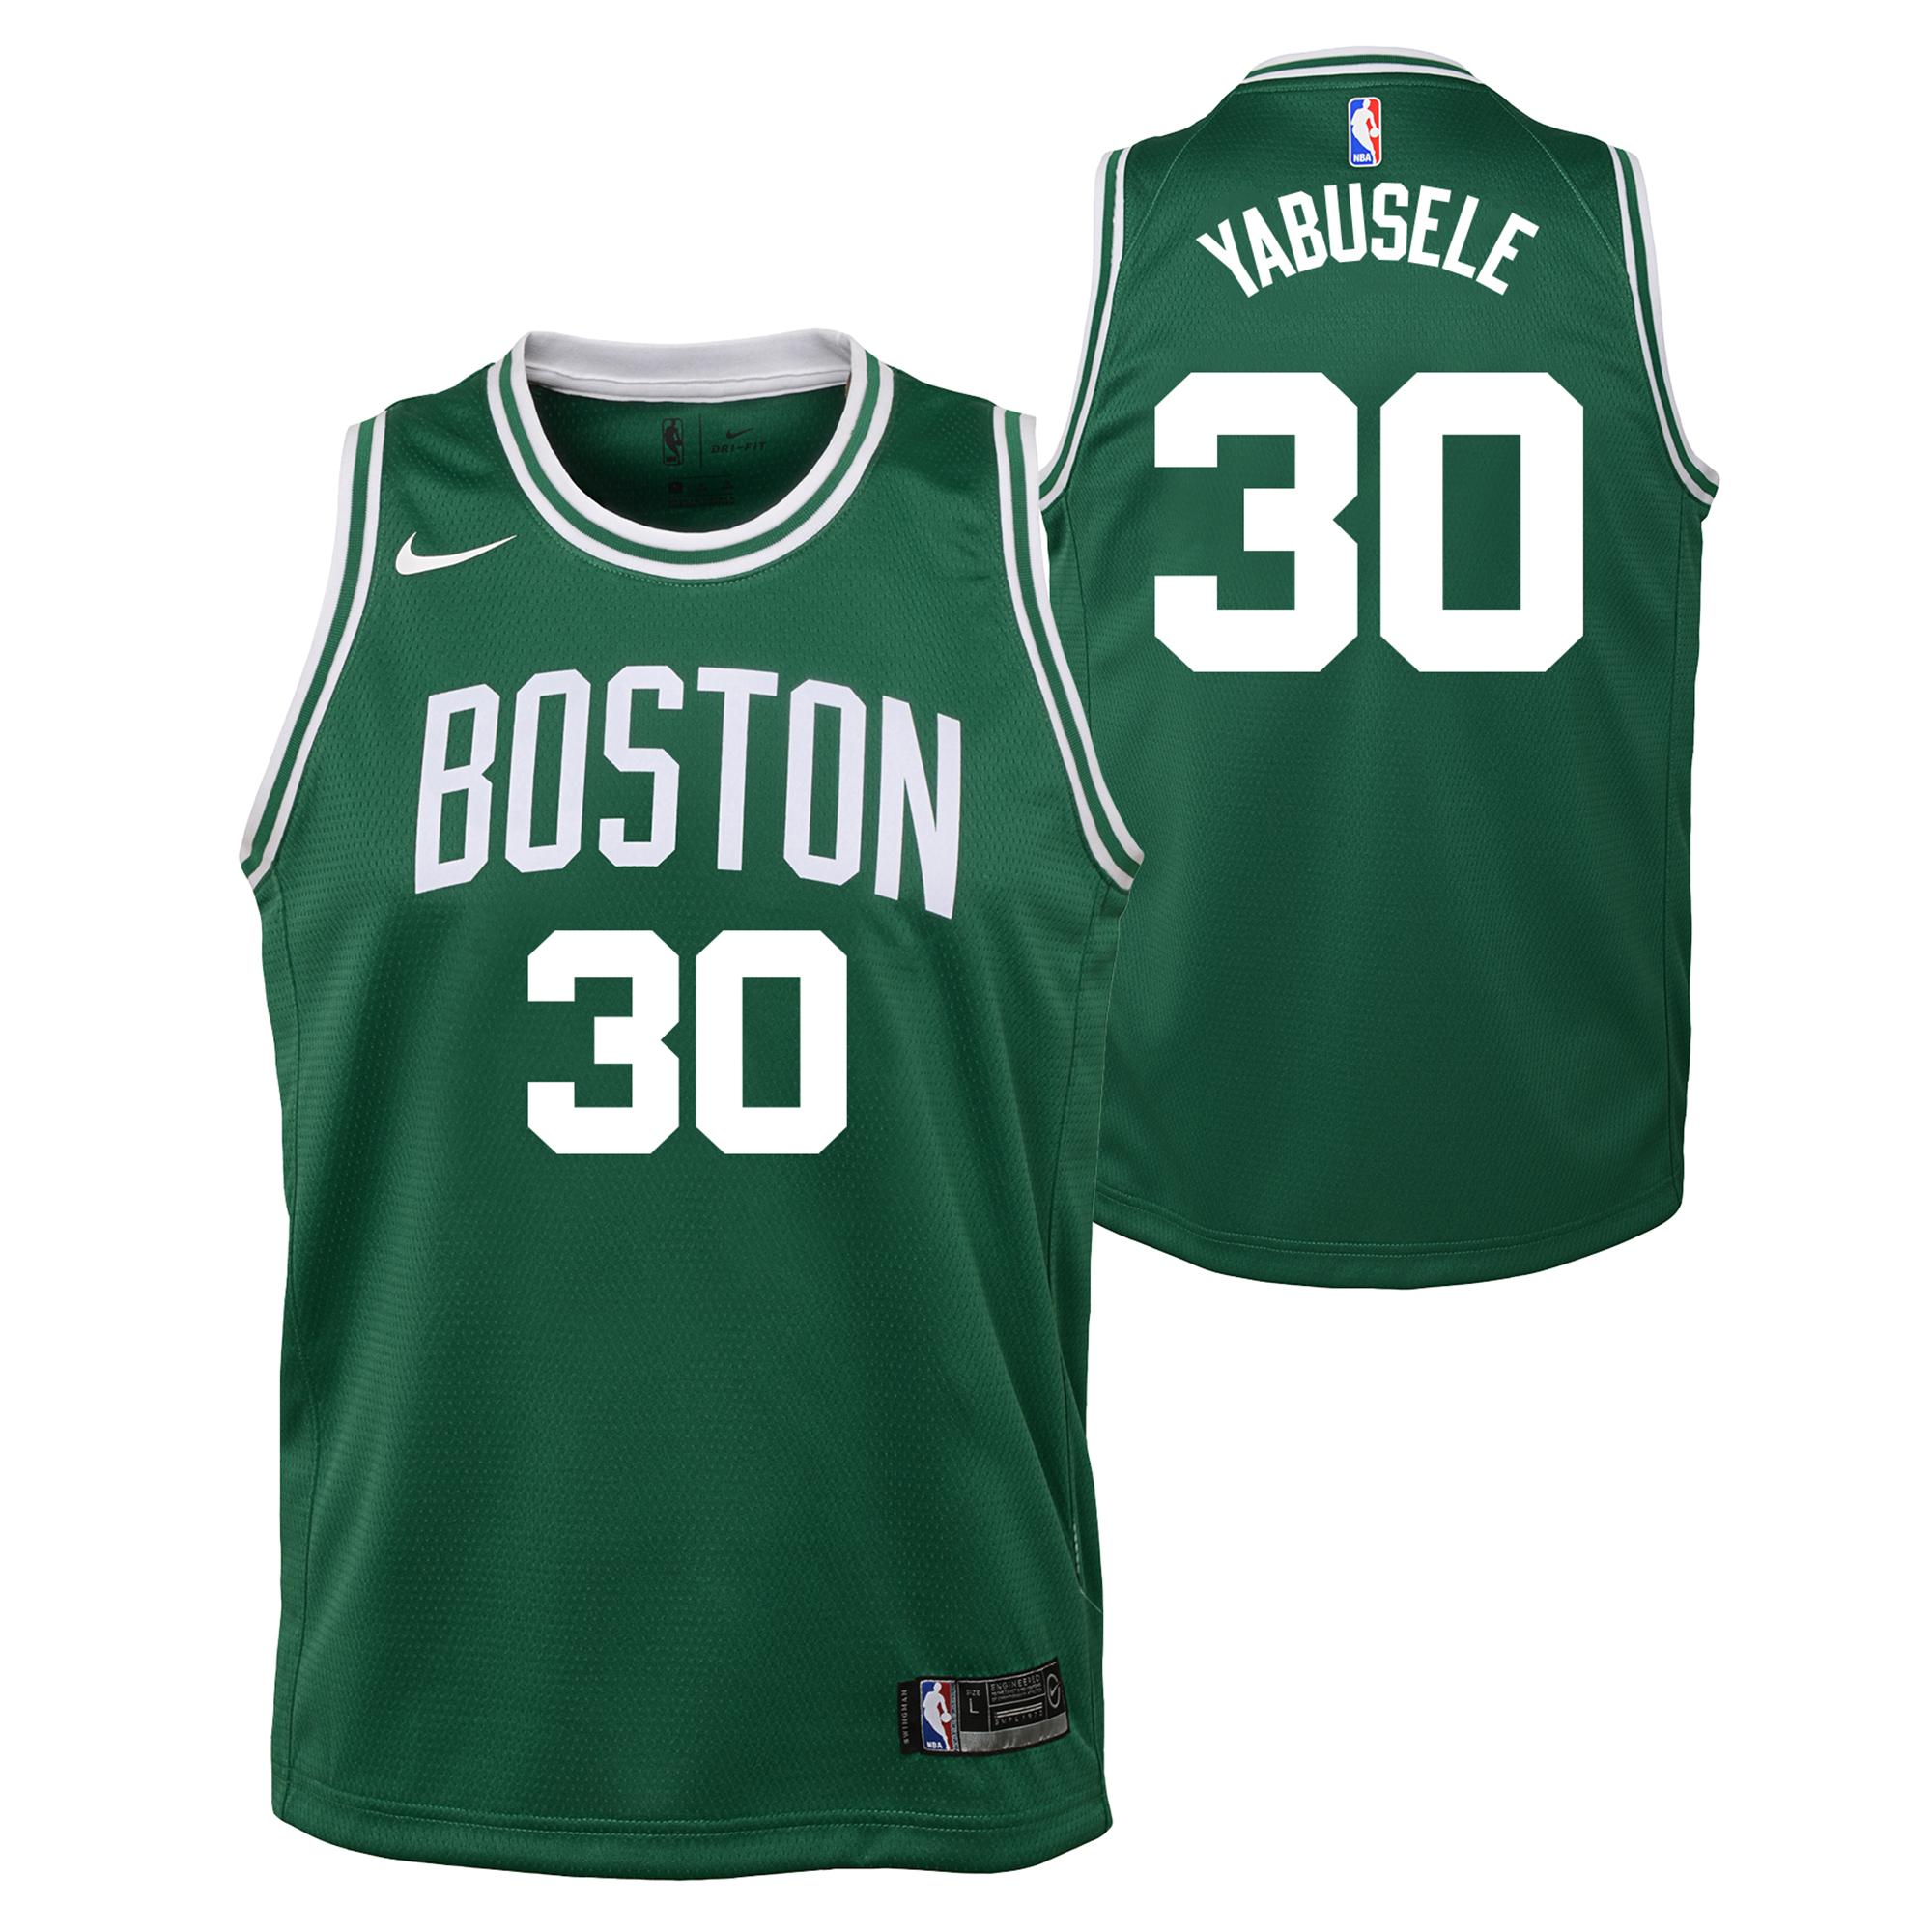 """Boston Celtics Nike Icon Swingman Jersey - Guerschon Yabusele - Youth"""